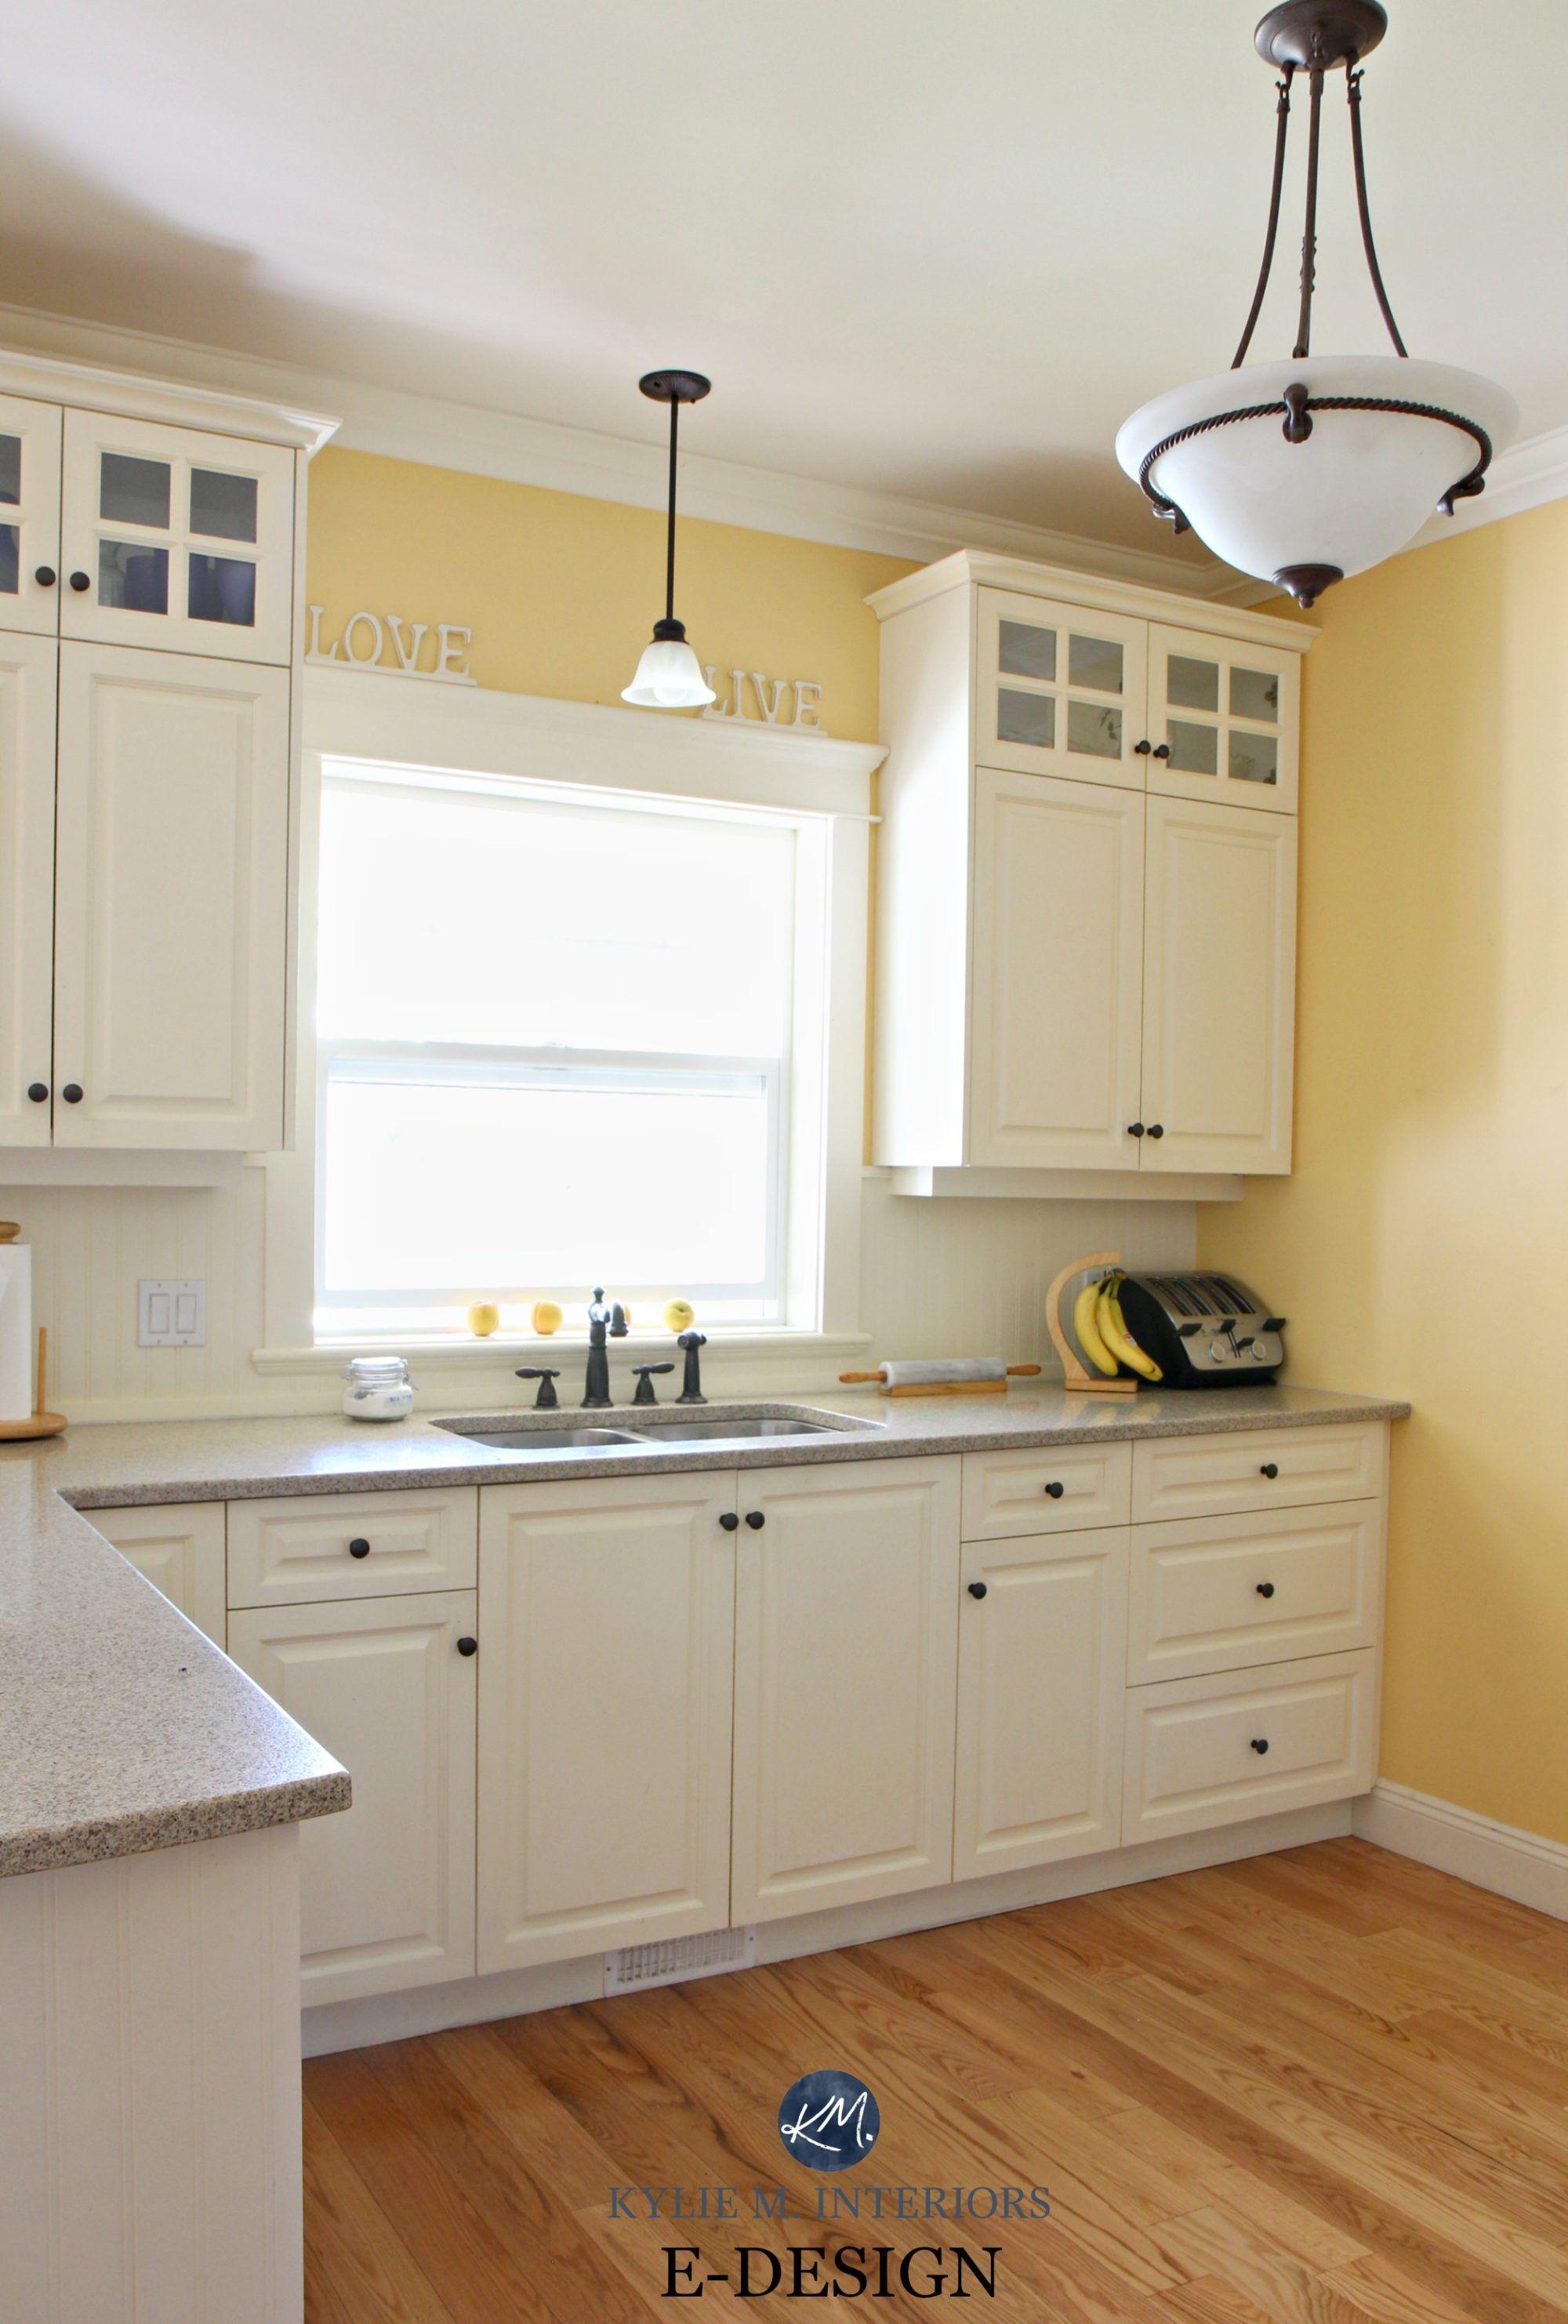 Kitchen with no window  pin by lisa scott on kitchen  pinterest